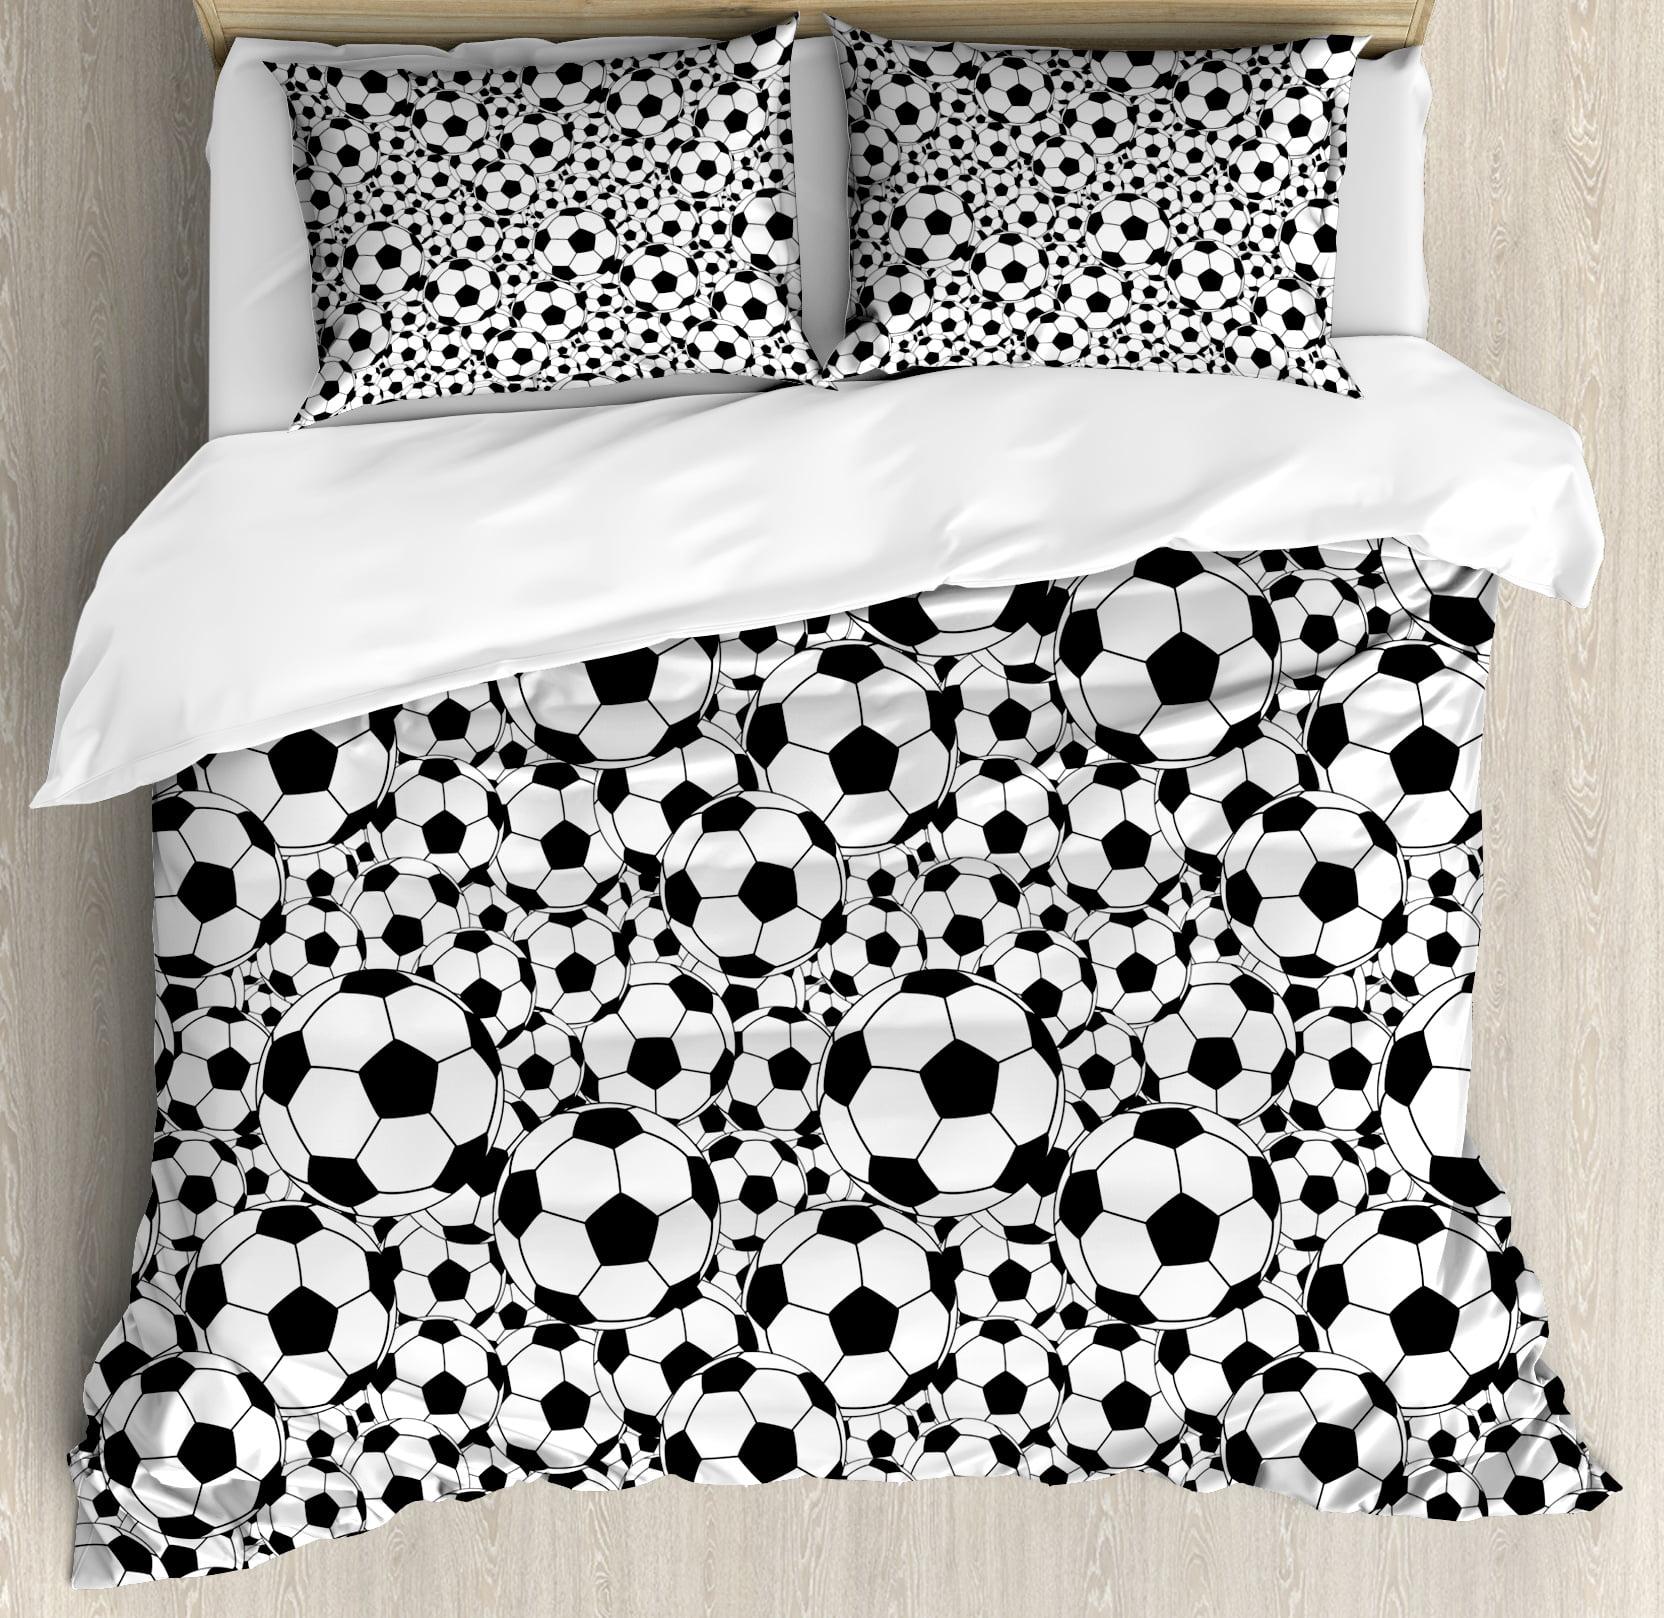 Soccer Queen Size Duvet Cover Set, Monochrome Design Pattern of Classical Football Balls... by Kozmos